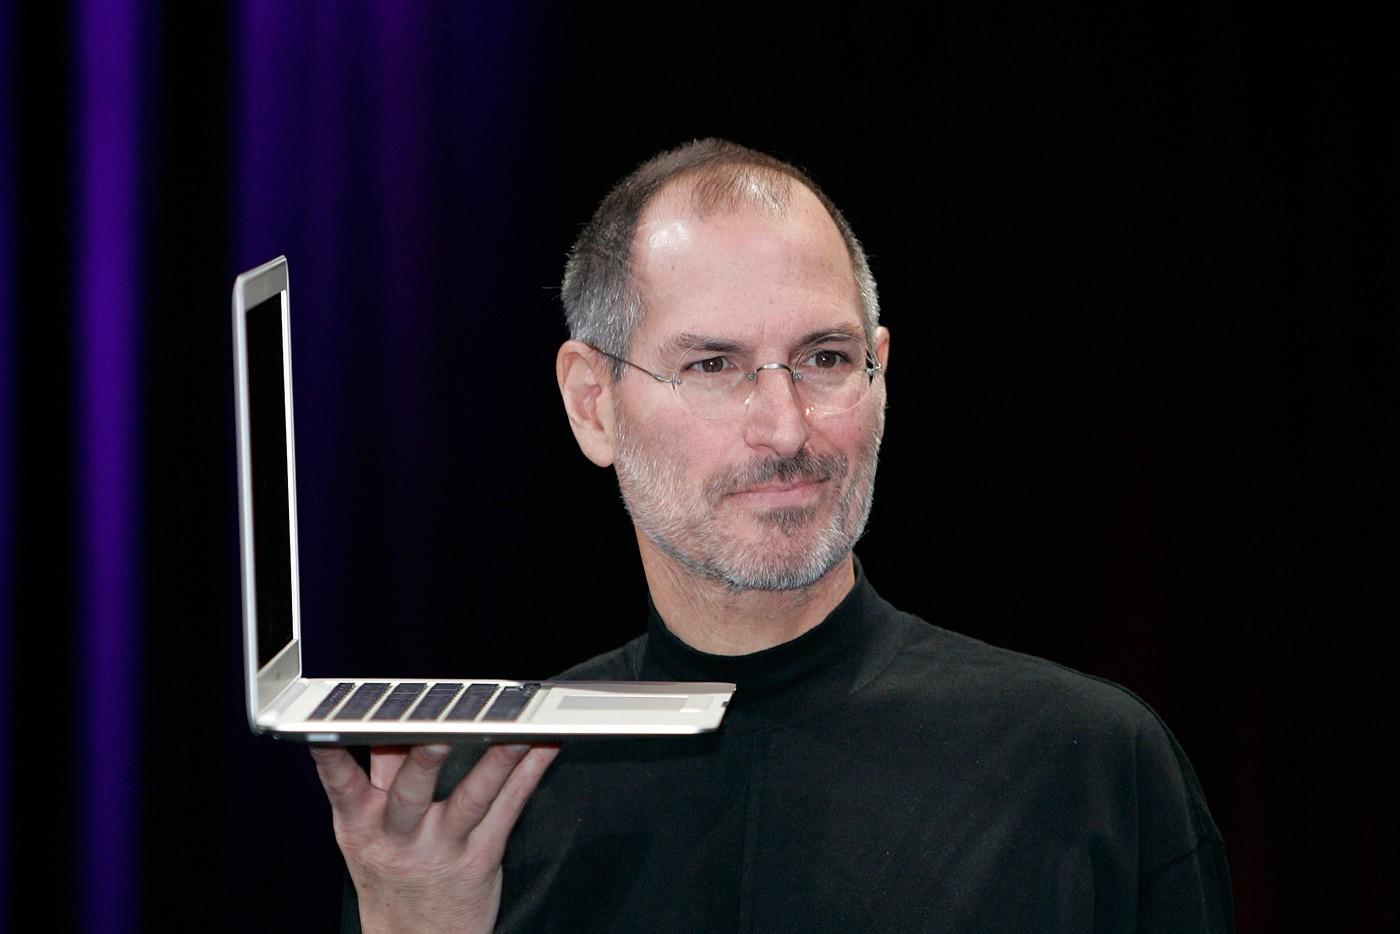 Новый MacBook Air покажут на WWDC 20181